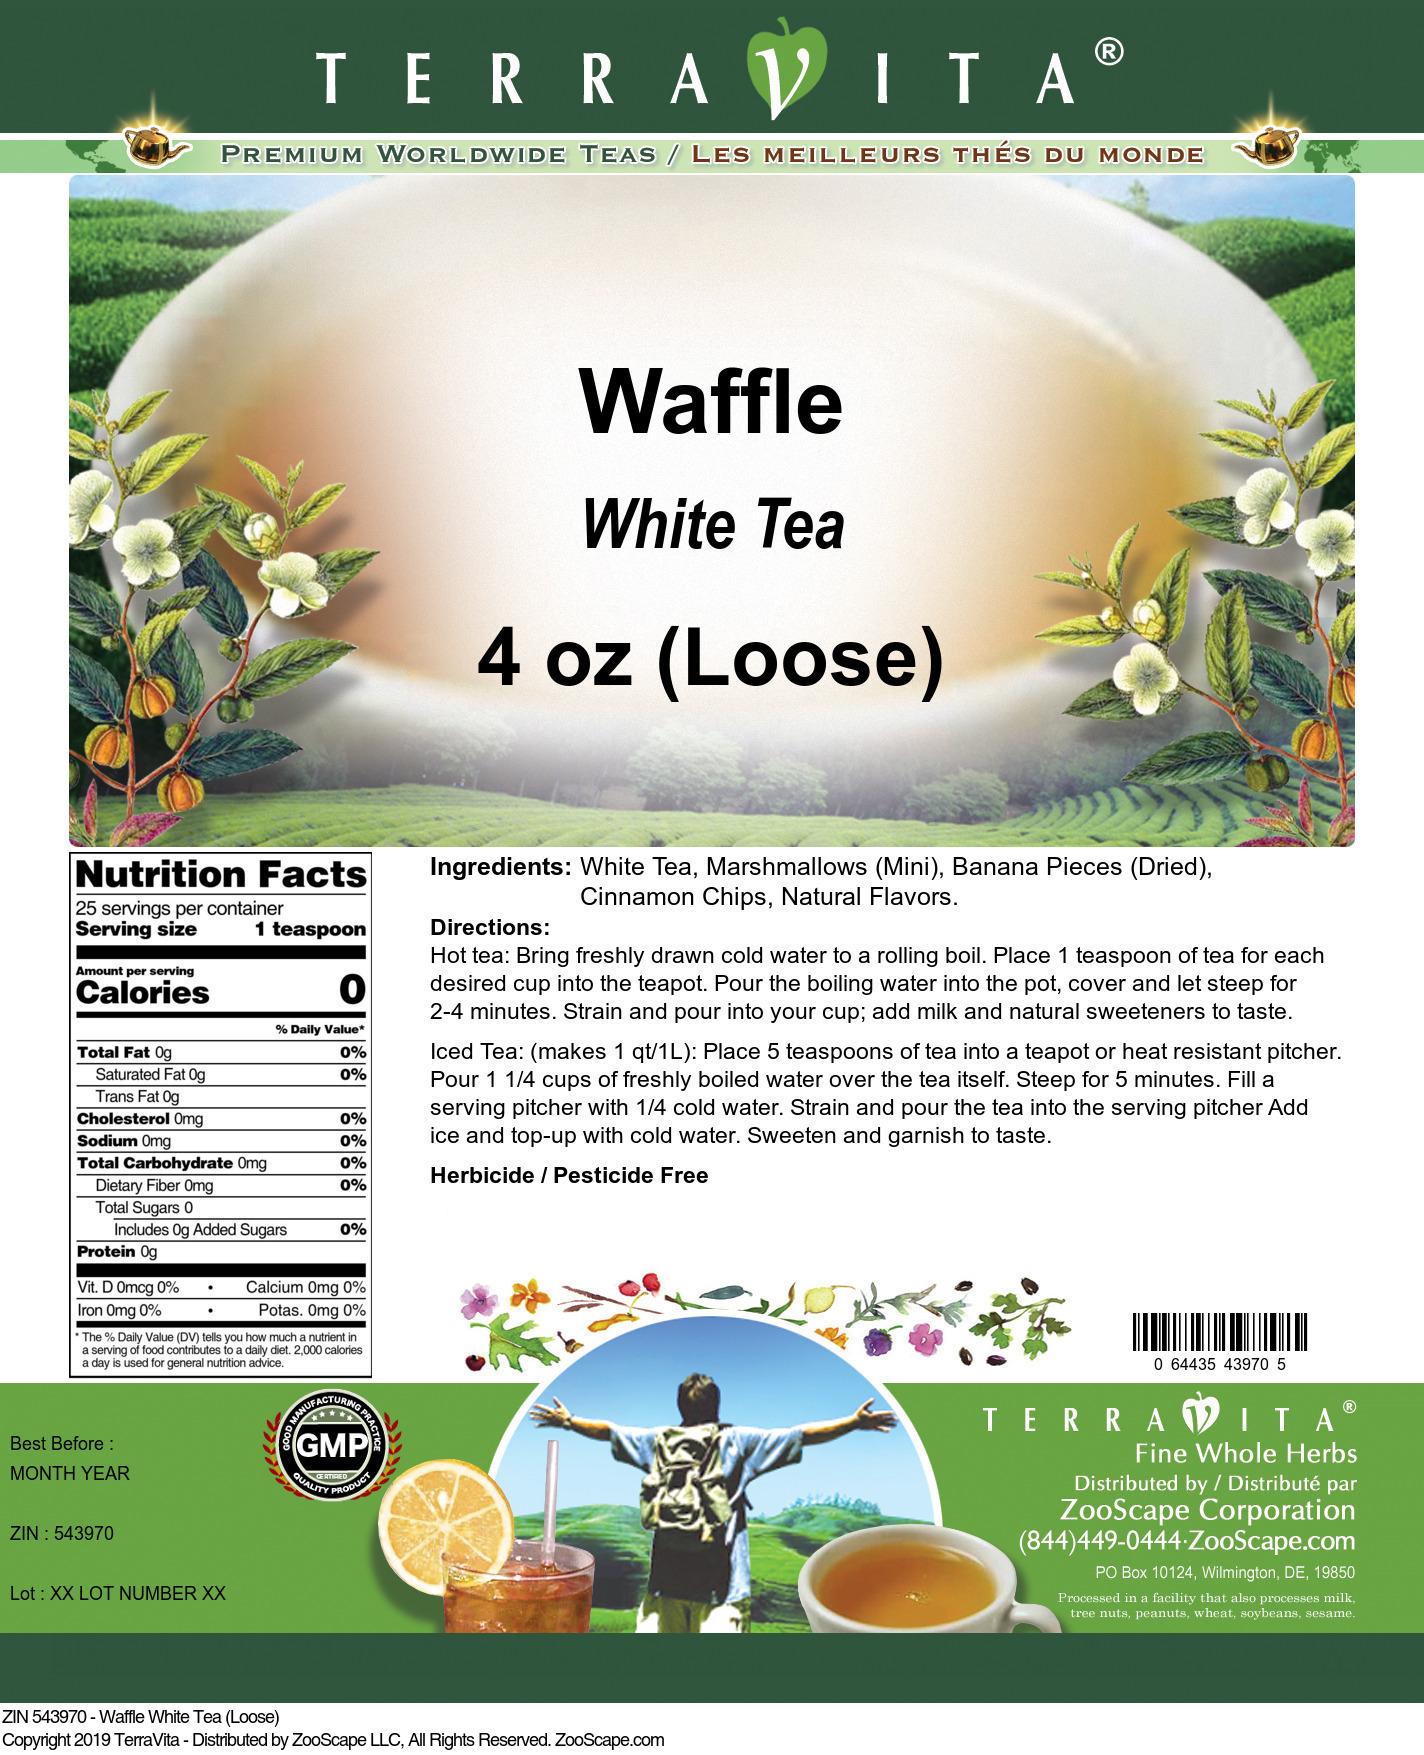 Waffle White Tea